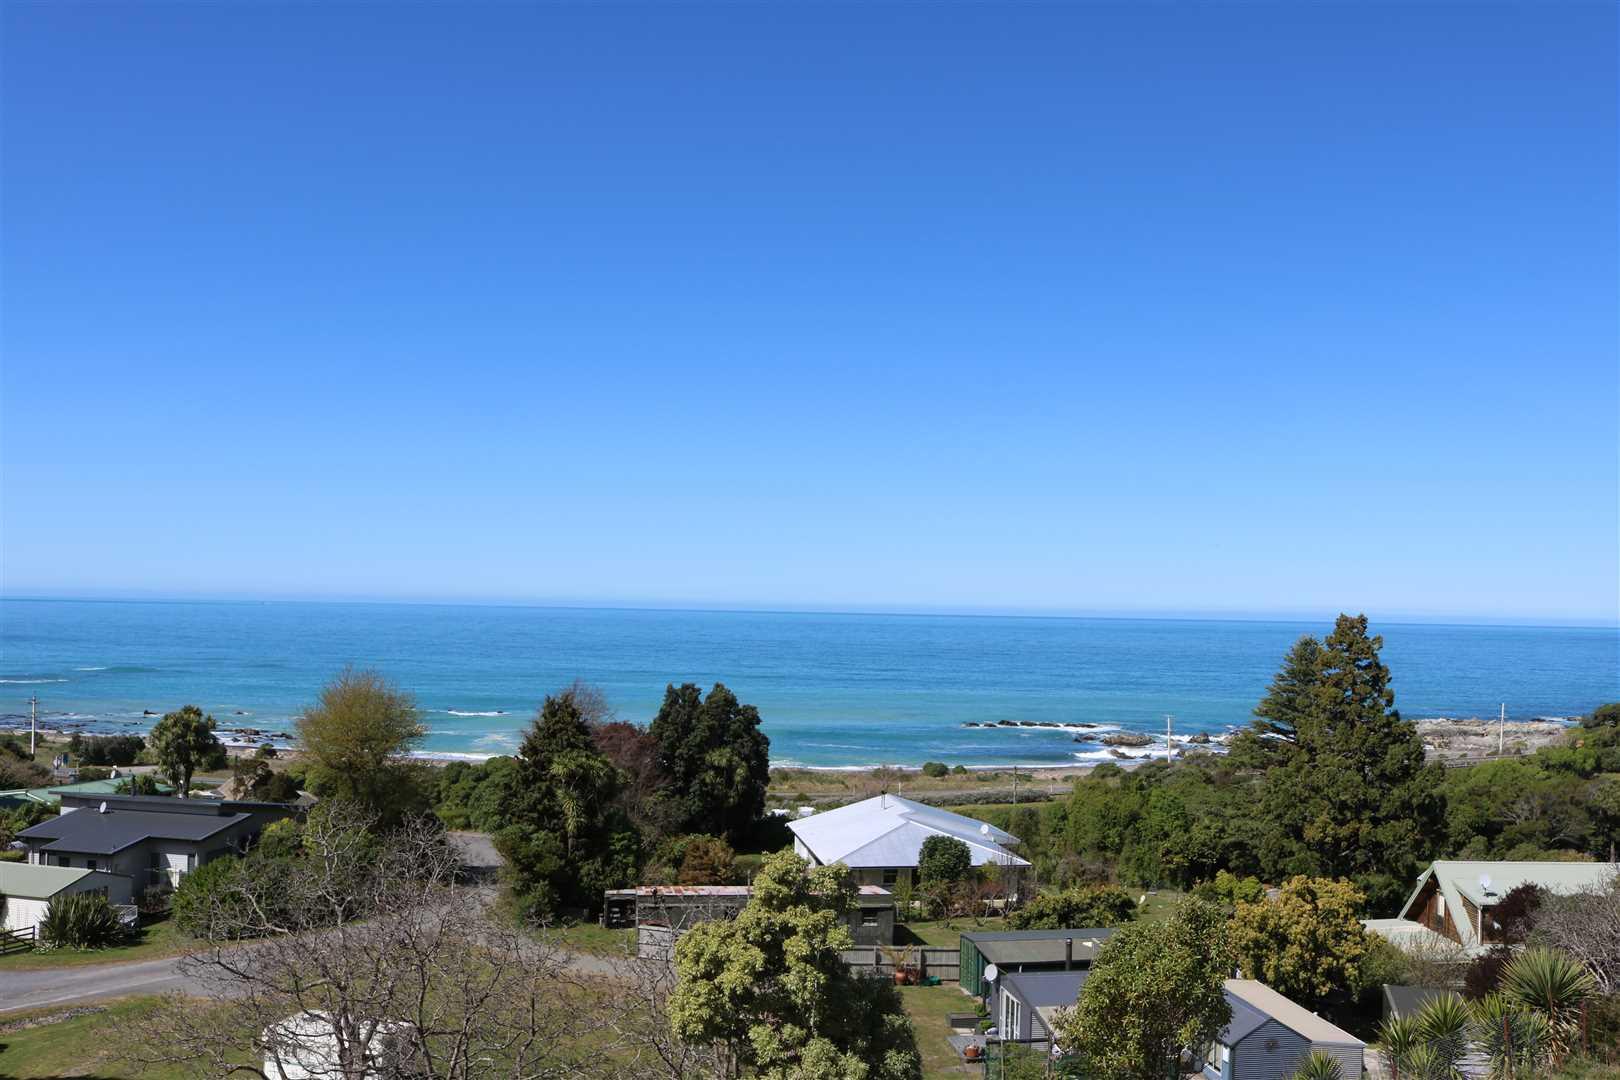 Stunning Sea Views, Entertaining, Relaxation, Fishing Base